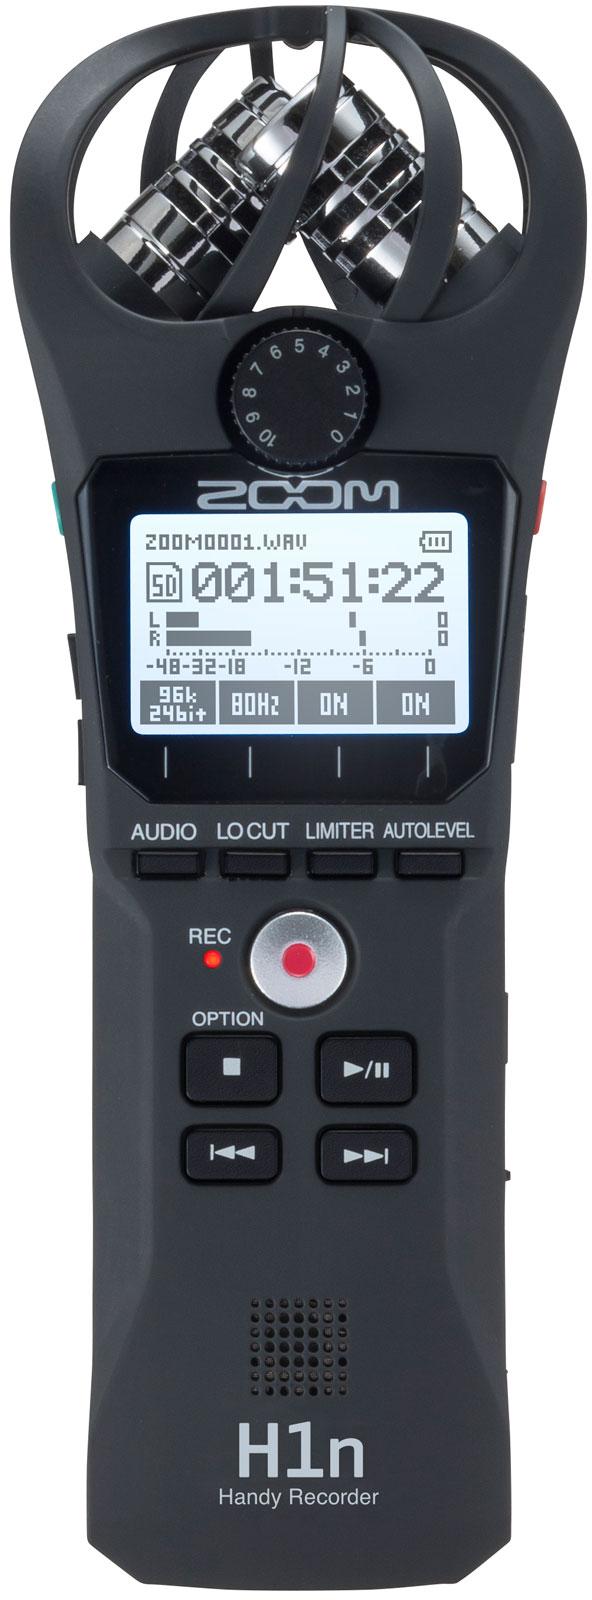 Zoom H1n Portabler Audio Recorder